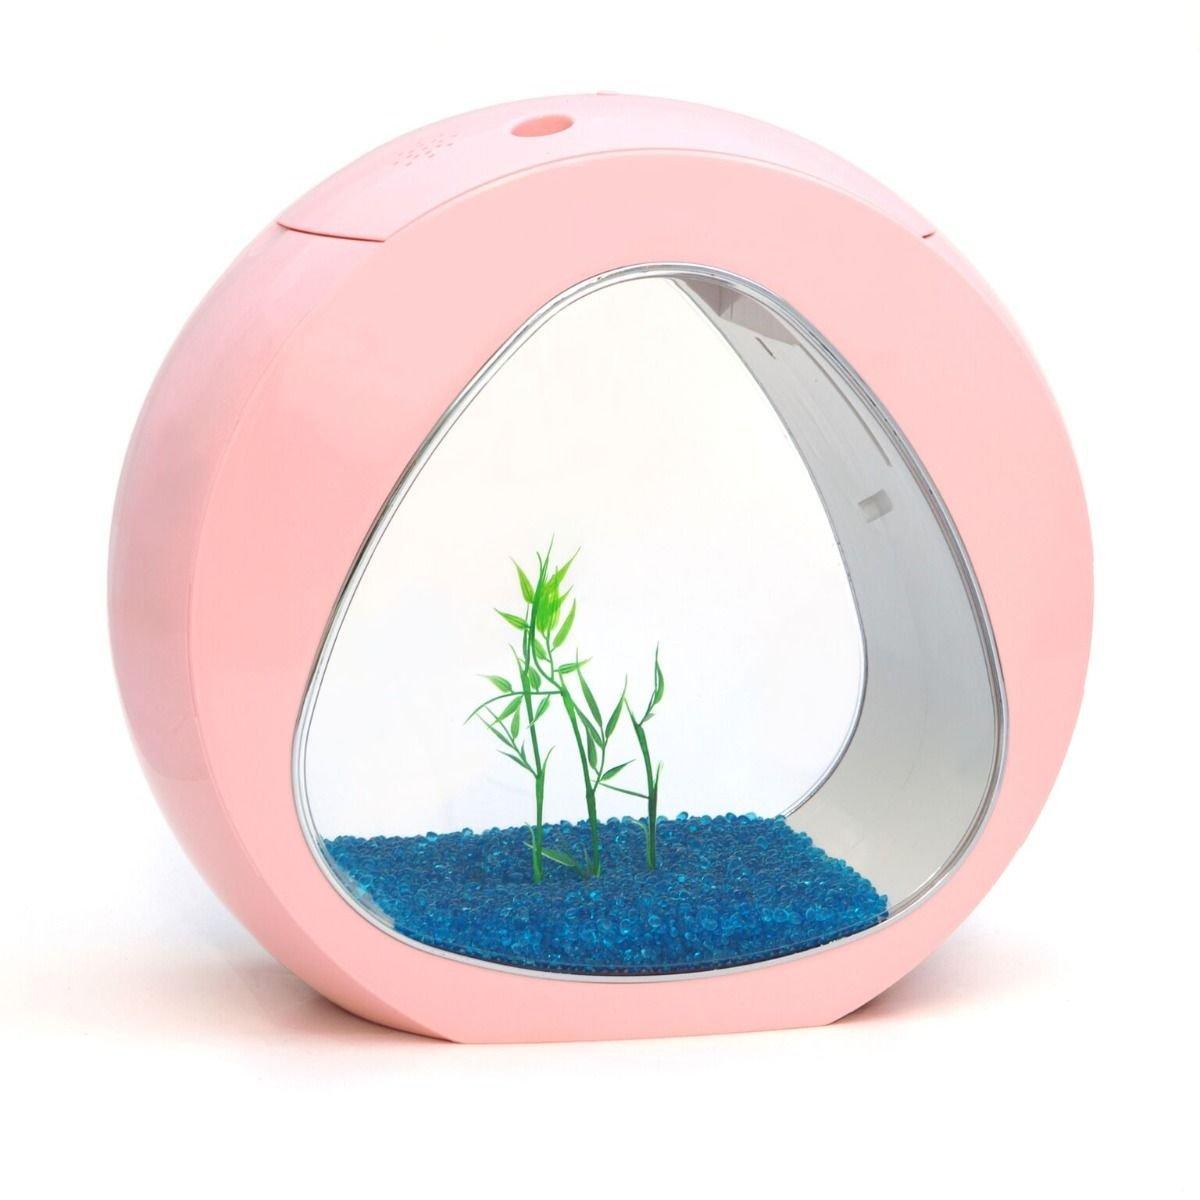 sun sun Kit Acuario diseño Circular 6 litros Rosa: Amazon.es: Productos para mascotas